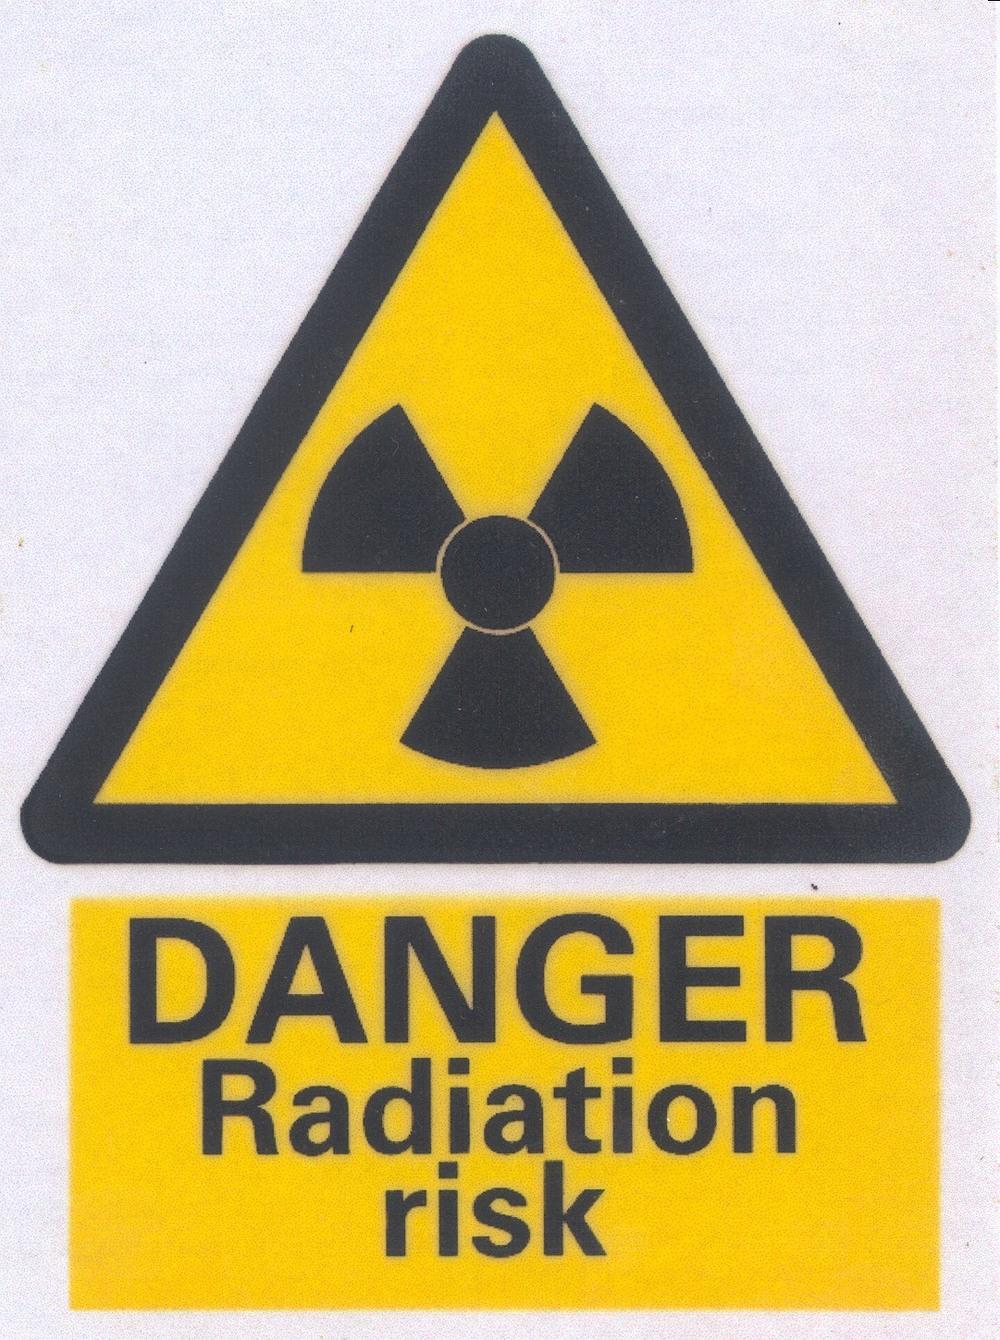 Radiation-image.jpg